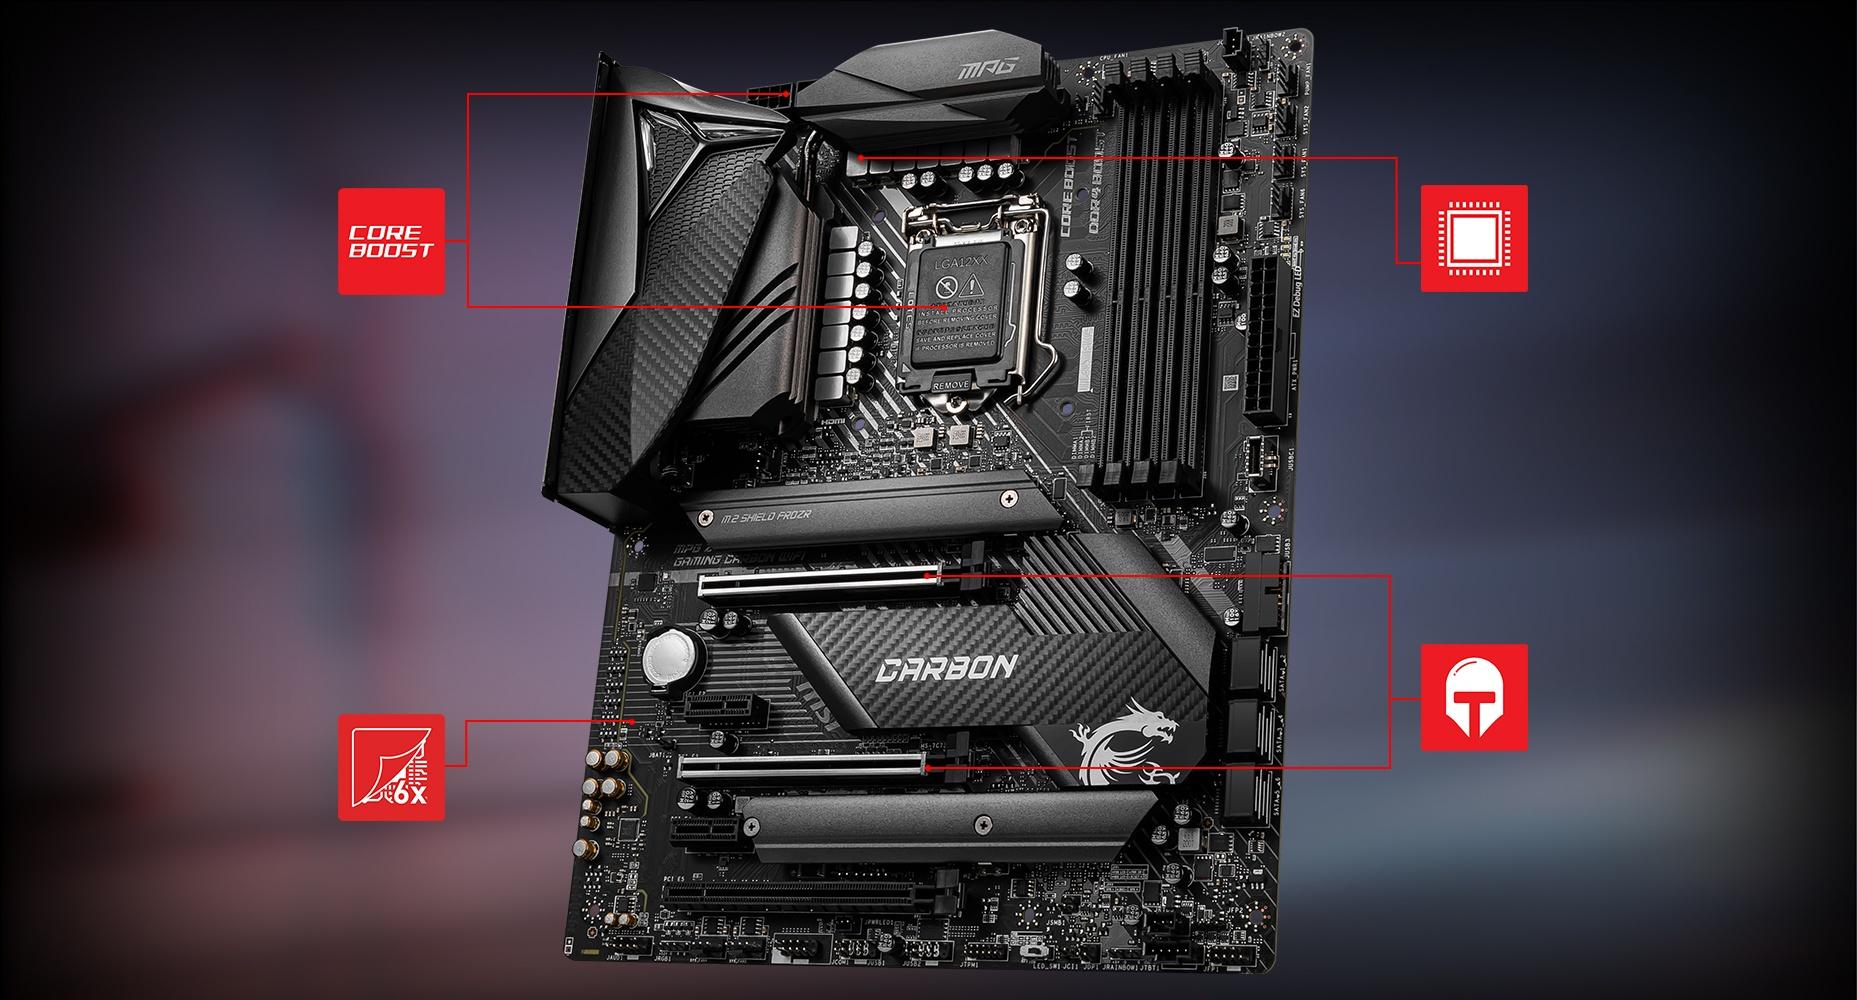 Creator TRX40 motherboard